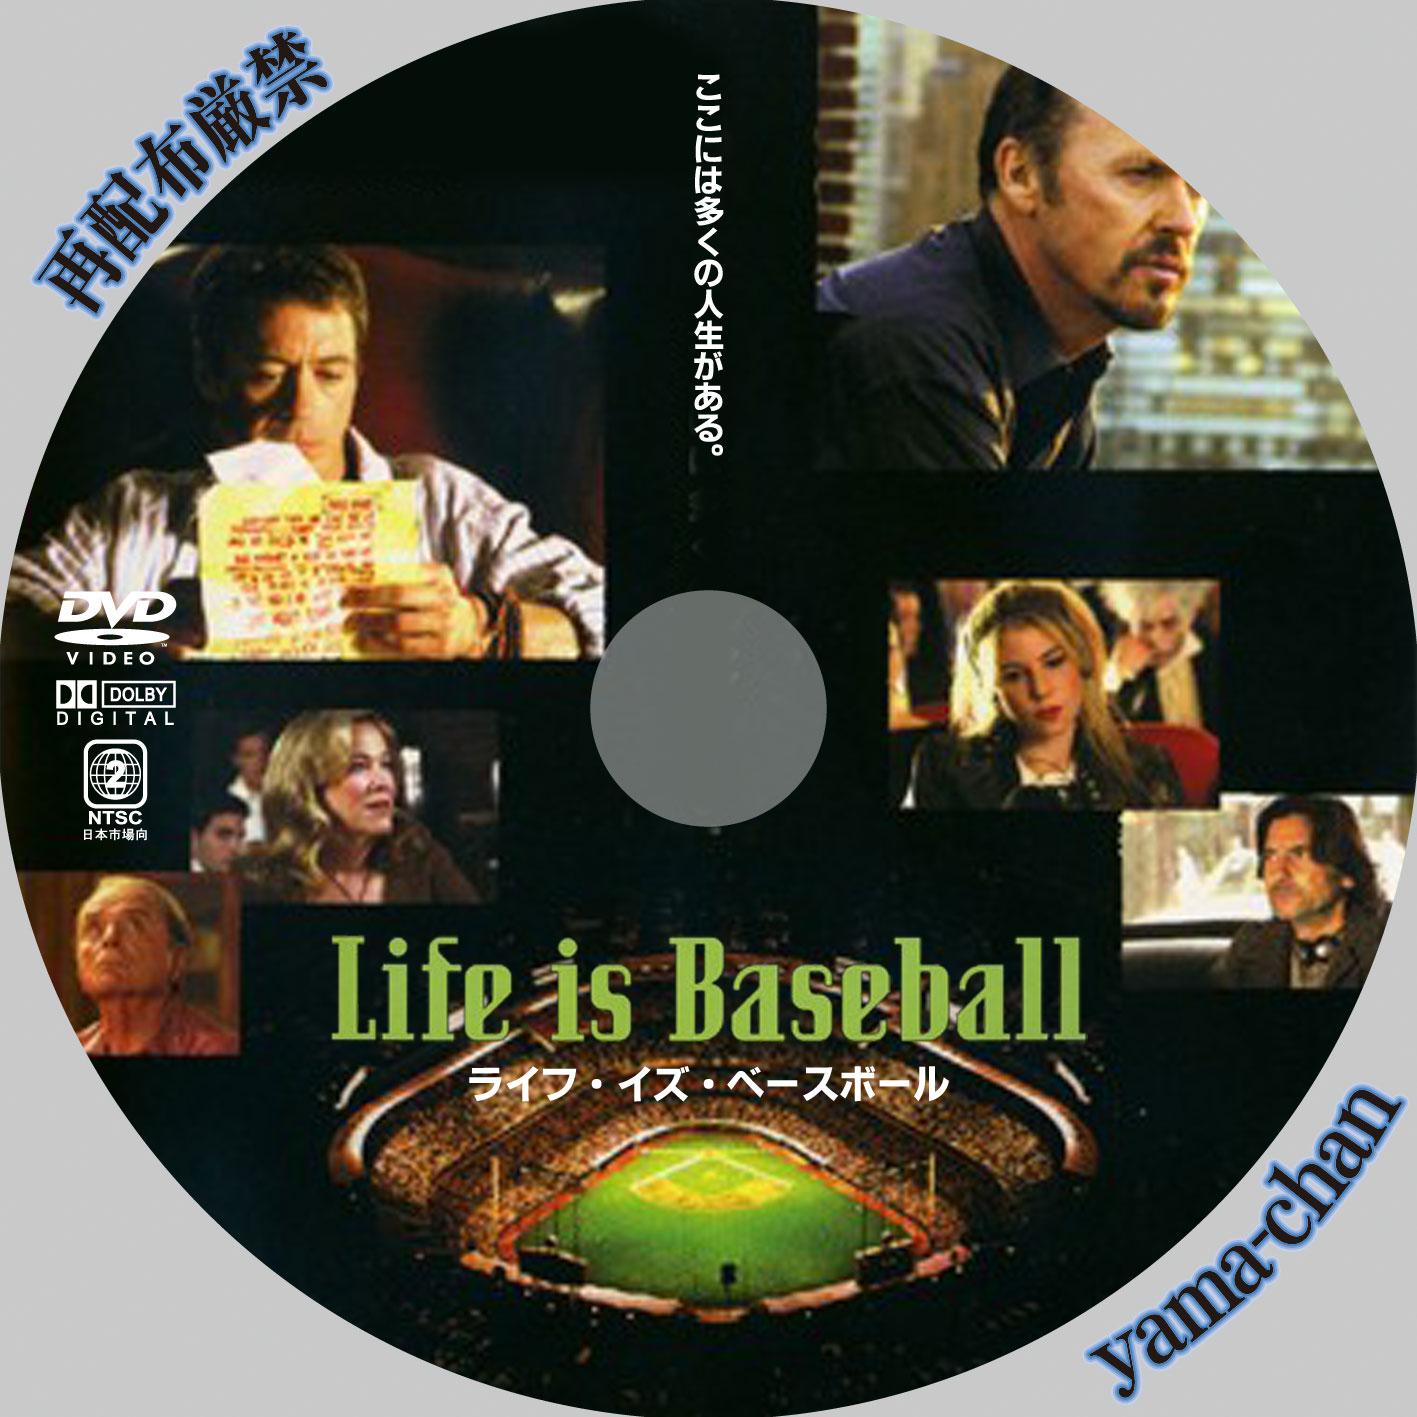 yama-chanのラベル工房 ライフ・イズ・ベースボール